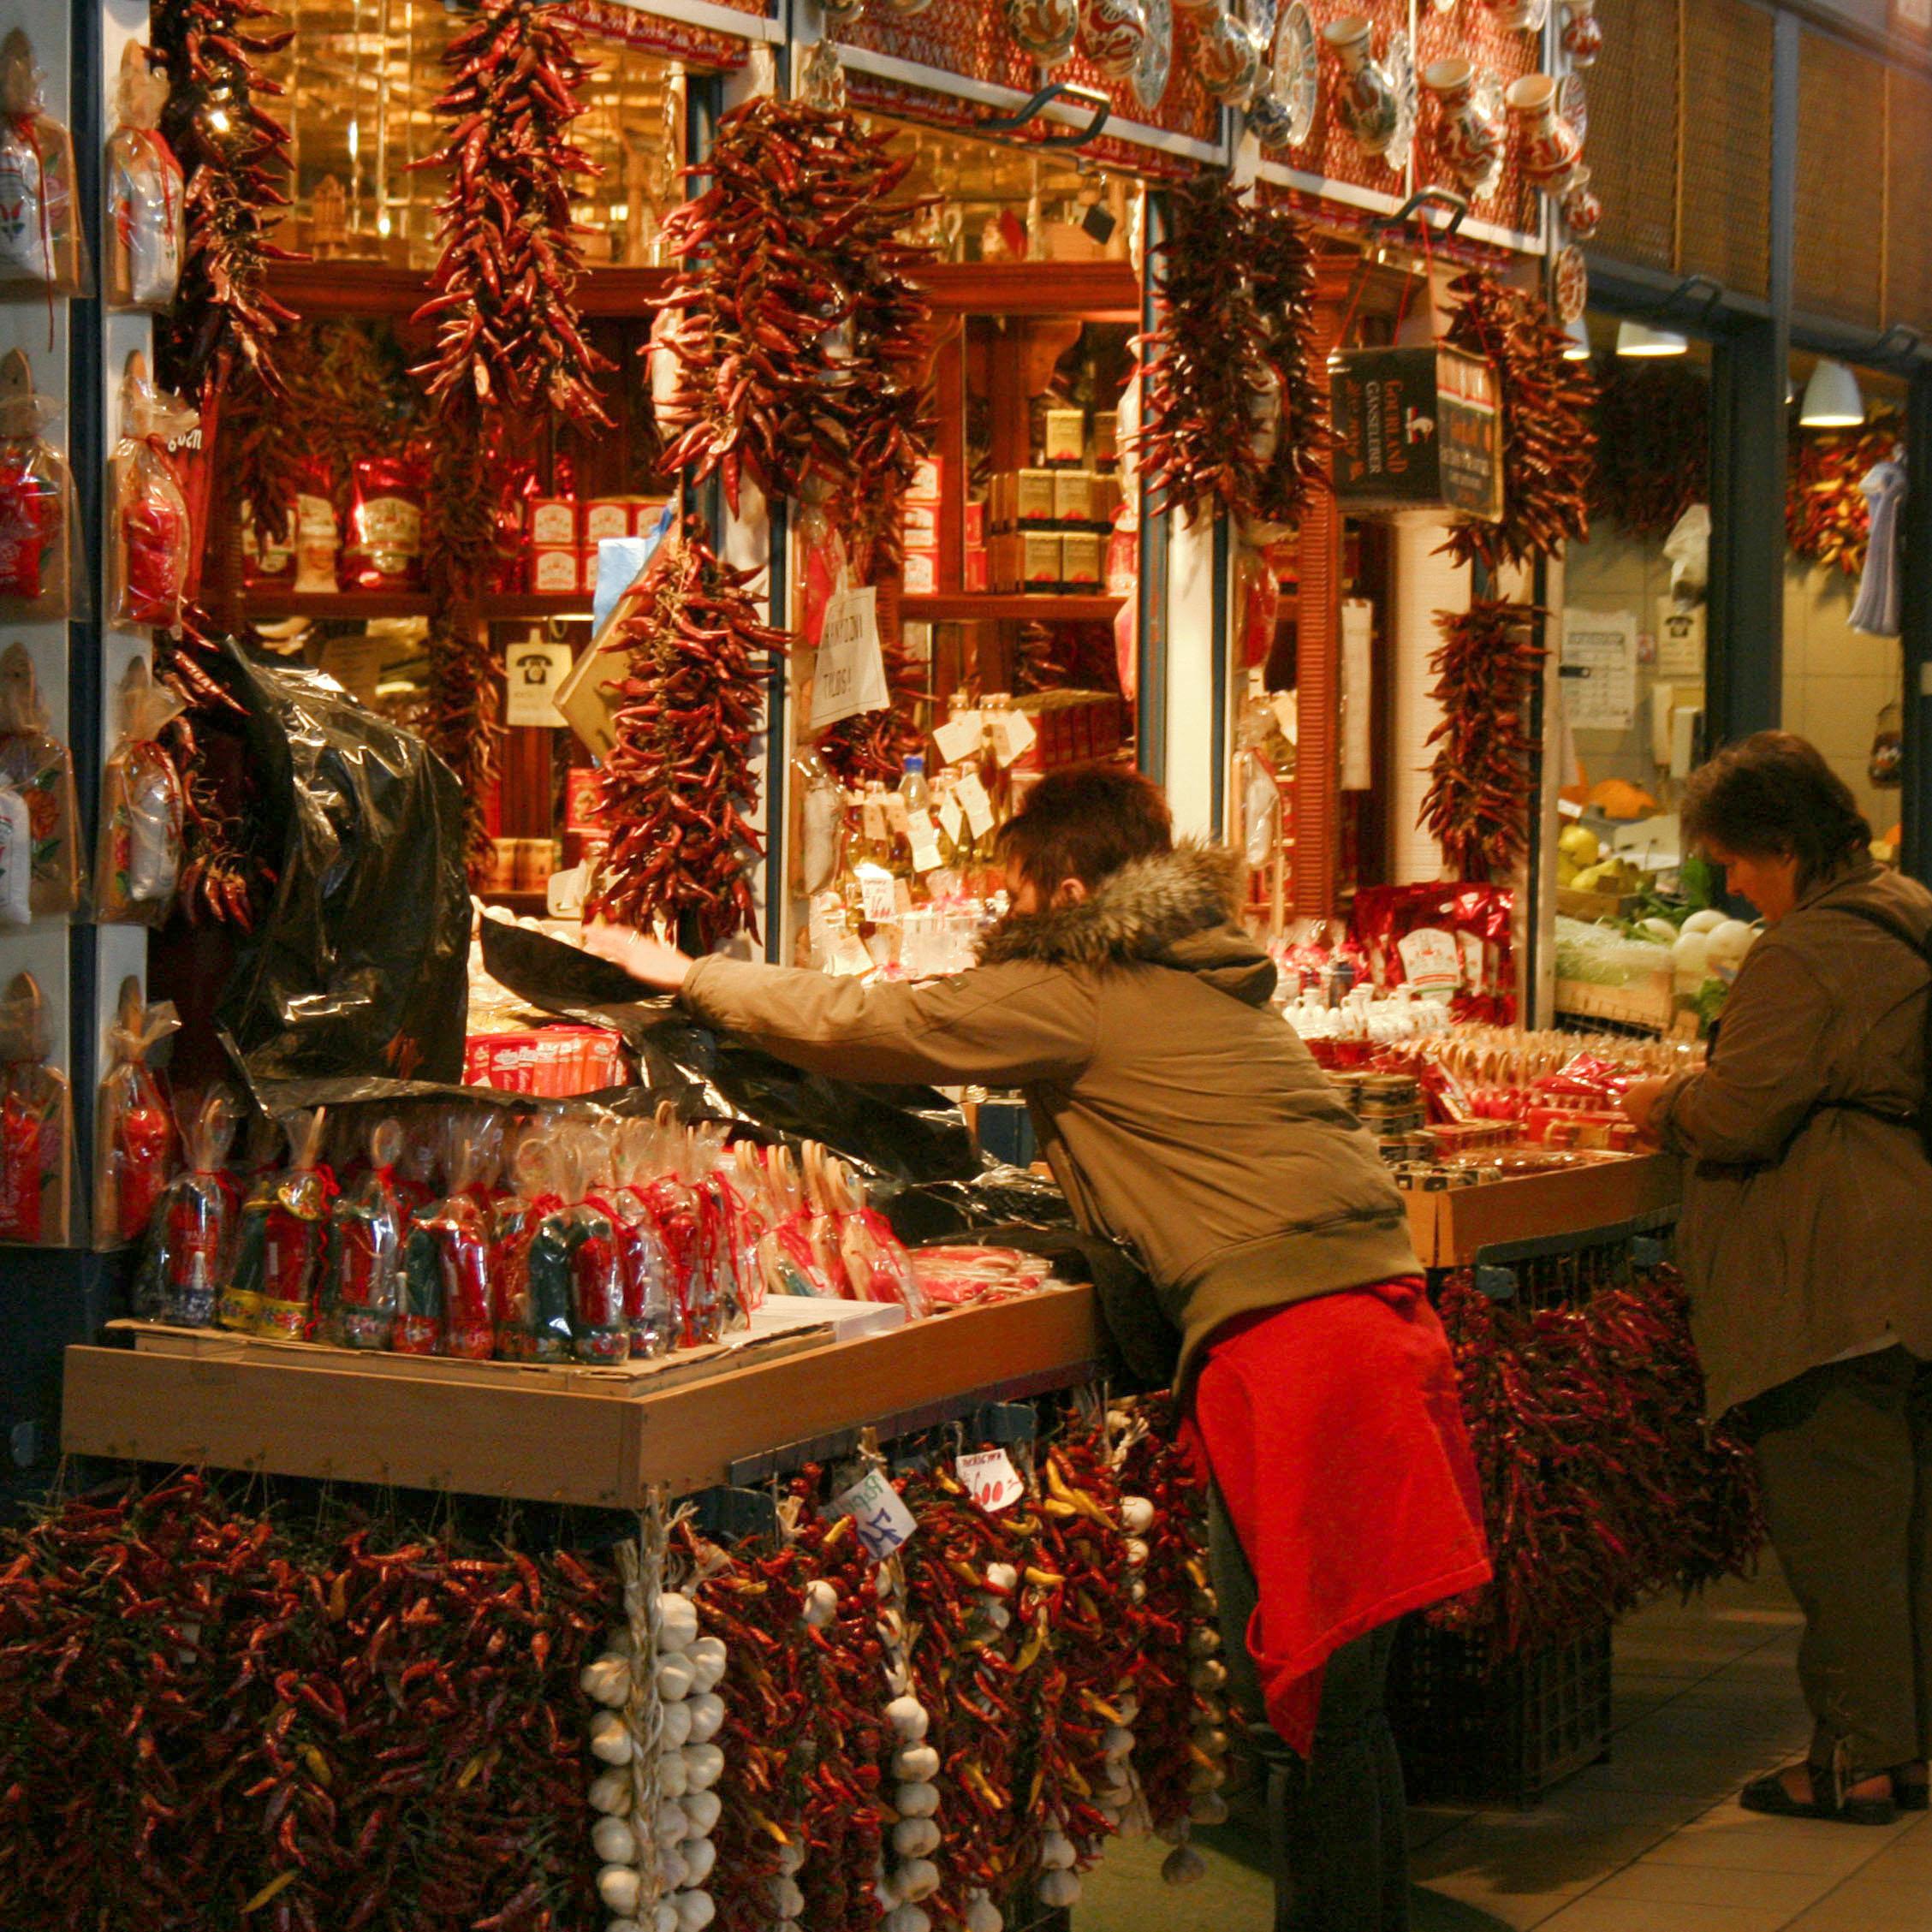 paprika-vendor-budapest-big-hall